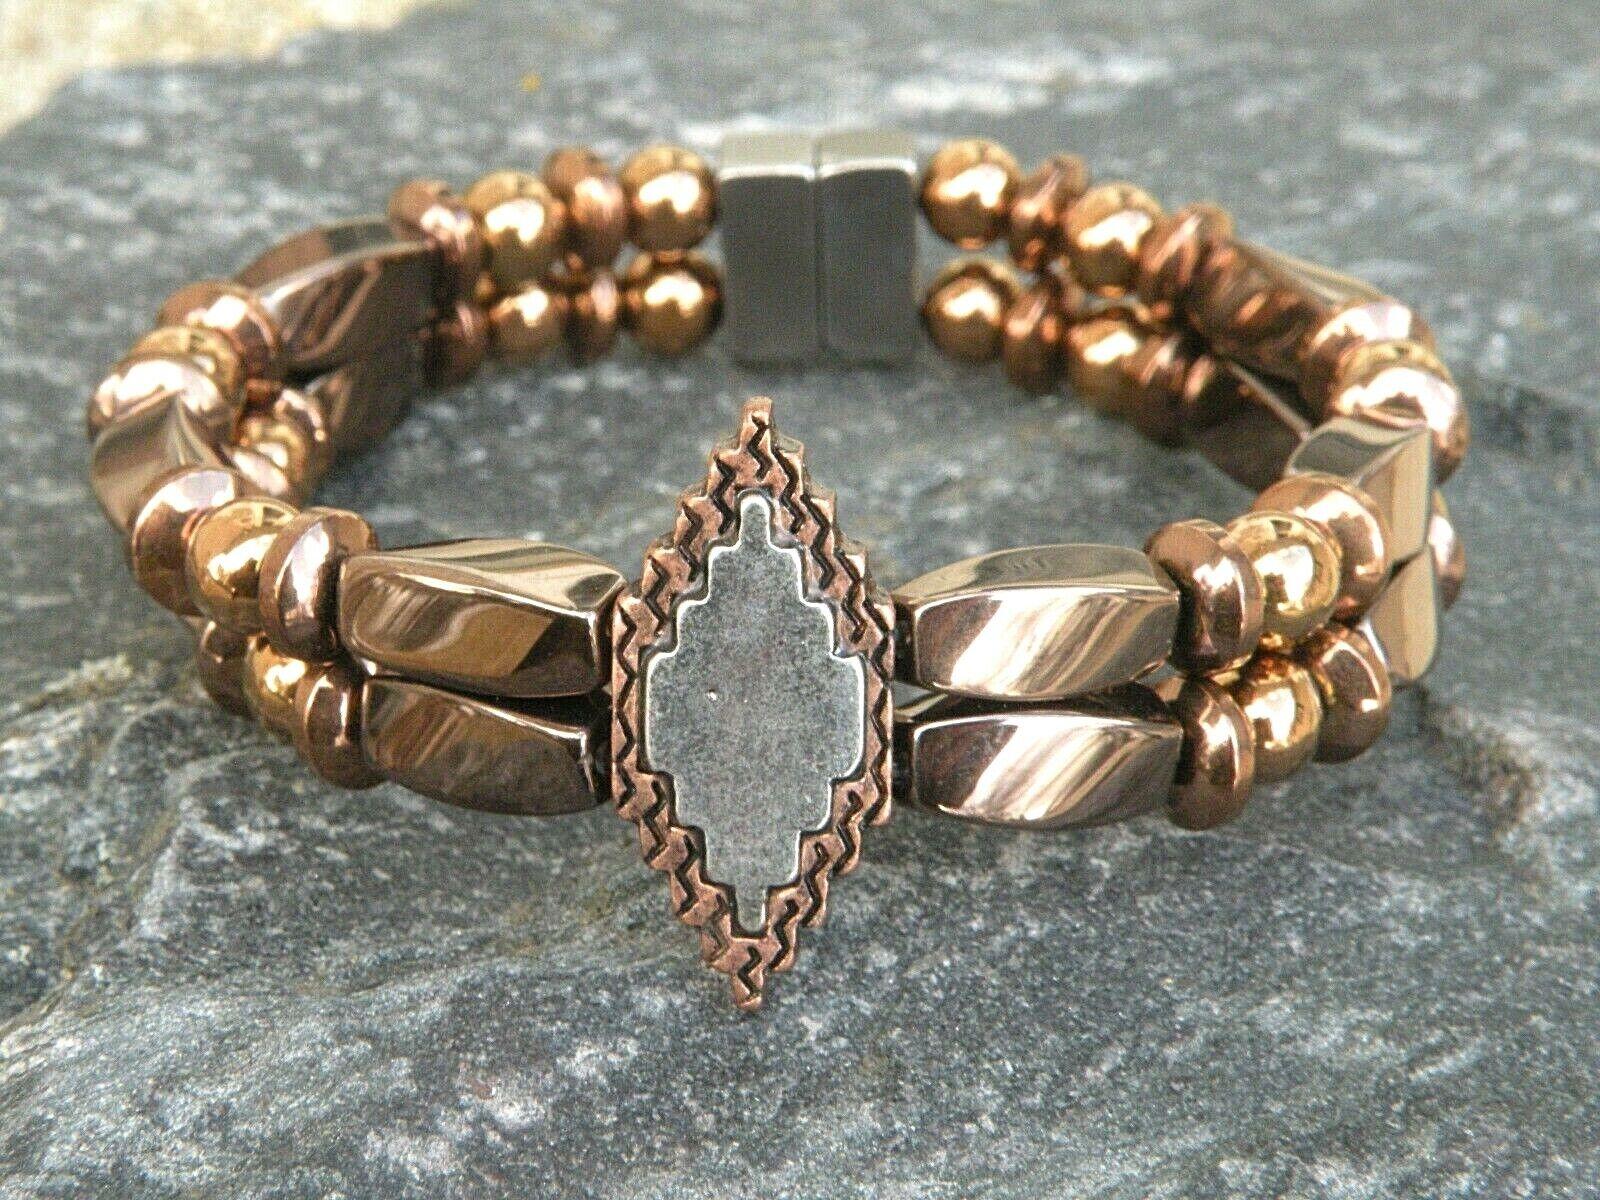 Copper Magnetic Hematite Bracelet Anklet 2 Row Diamond Shaped Pendant